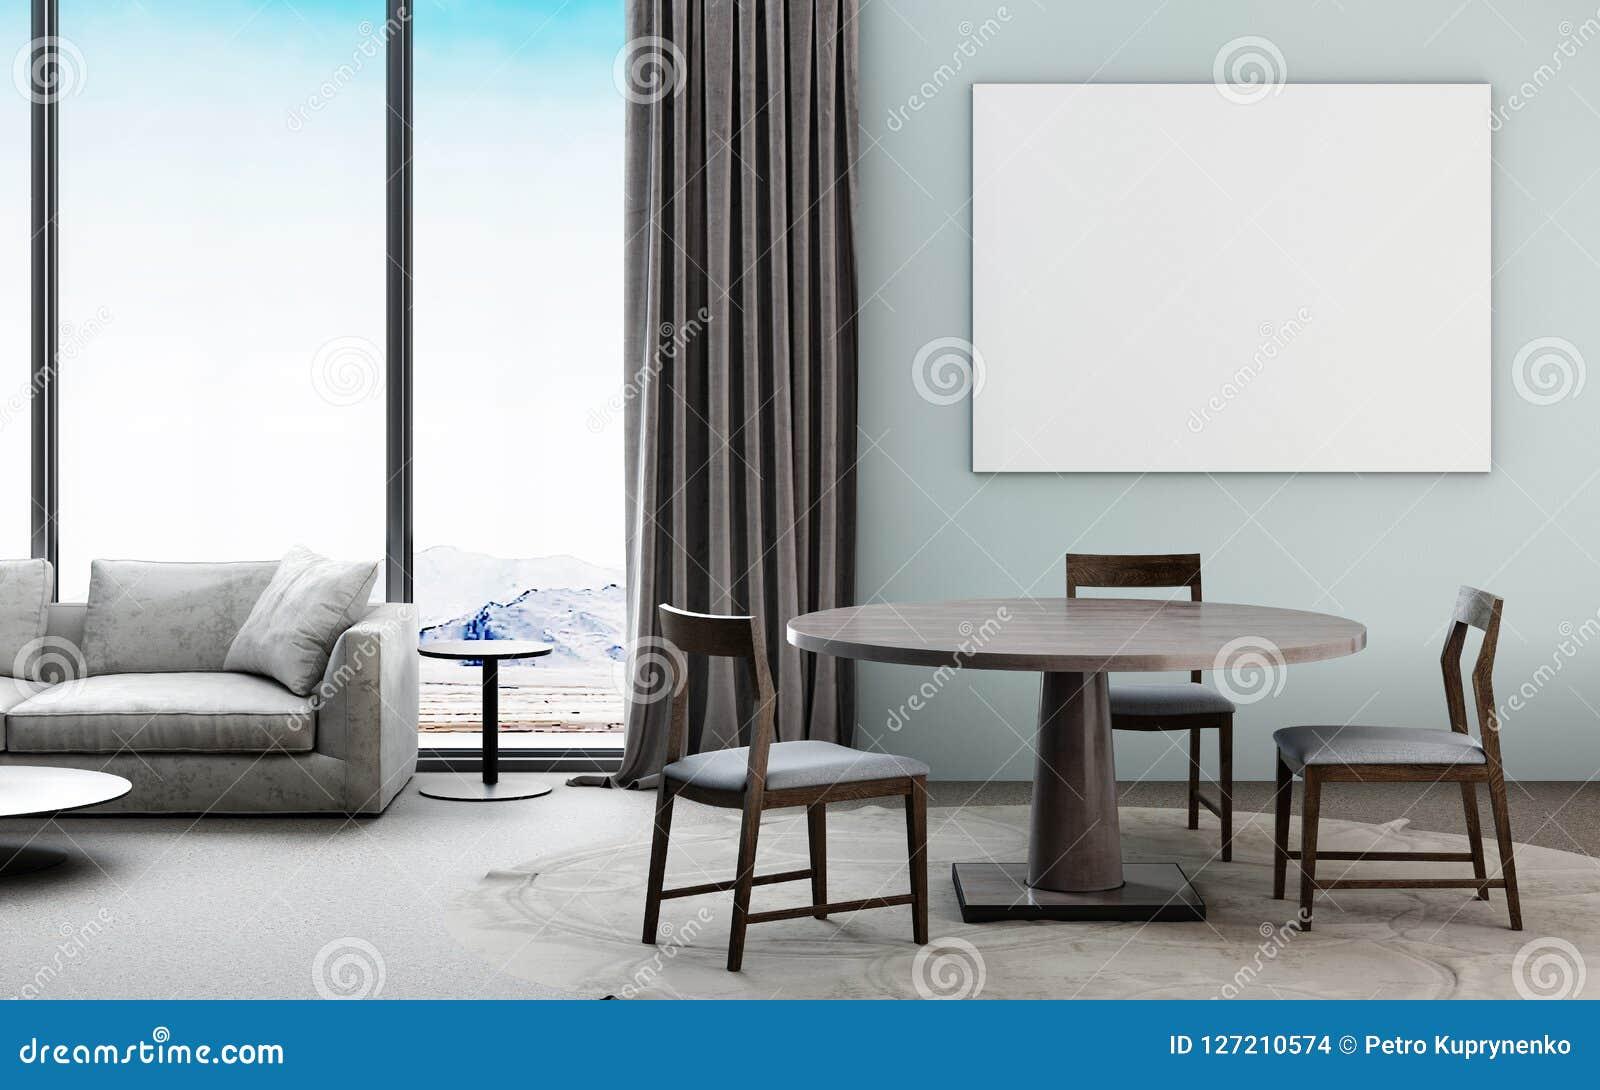 Красивый интерьер живущей комнаты с плакатом модель-макета incontemporary